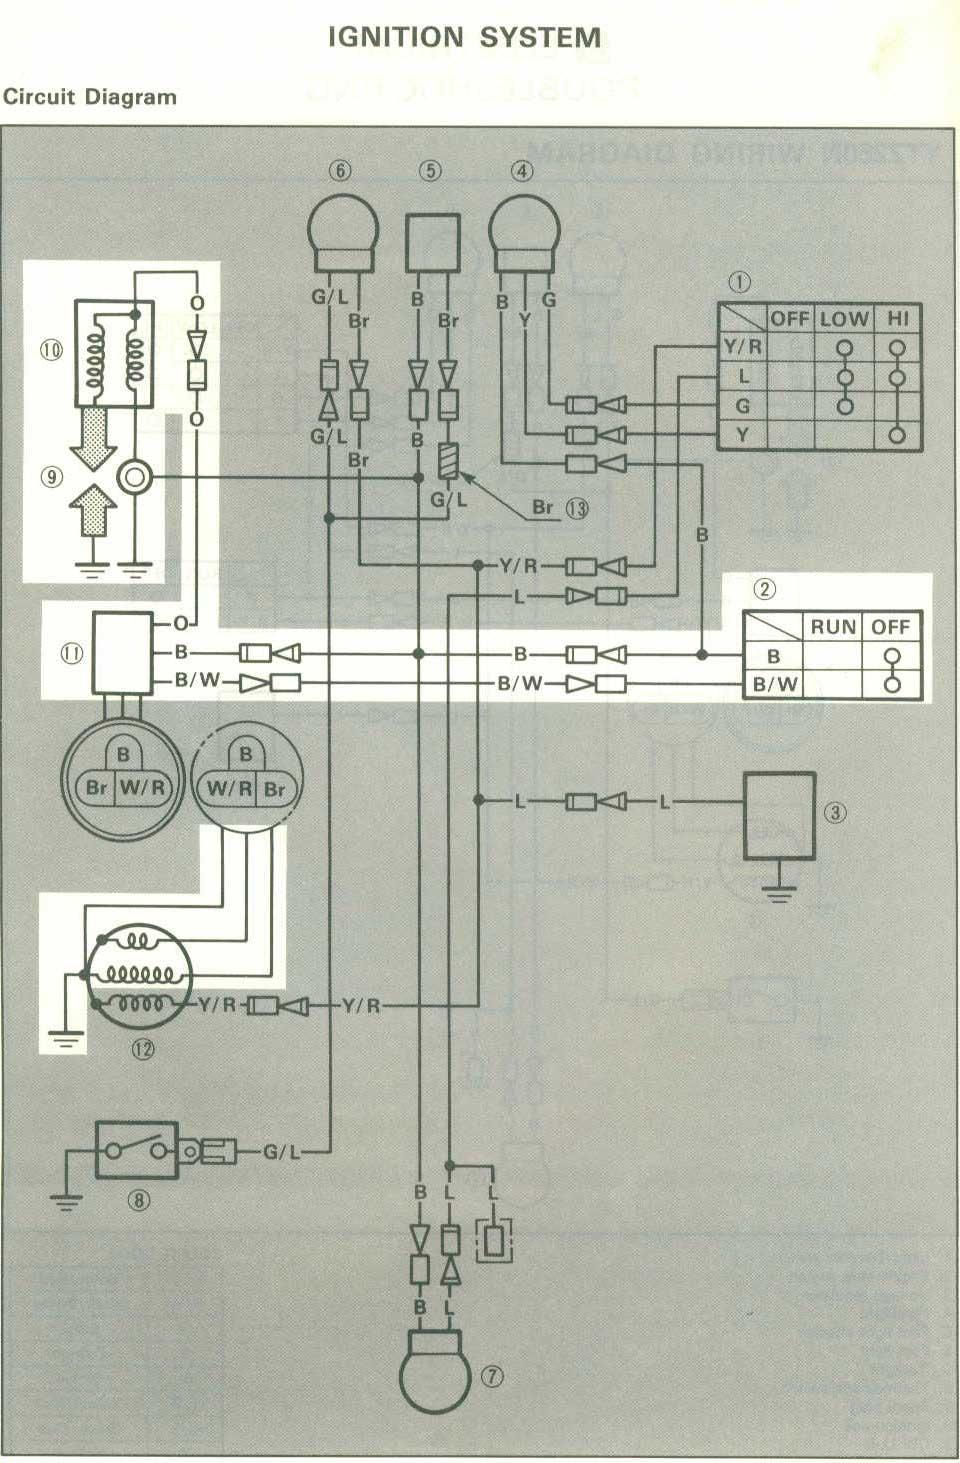 2000 Arctic Cat 500 Wiring Diagram Nissan Ac Wiring Diagram Plymouth Cukk Jeanjaures37 Fr